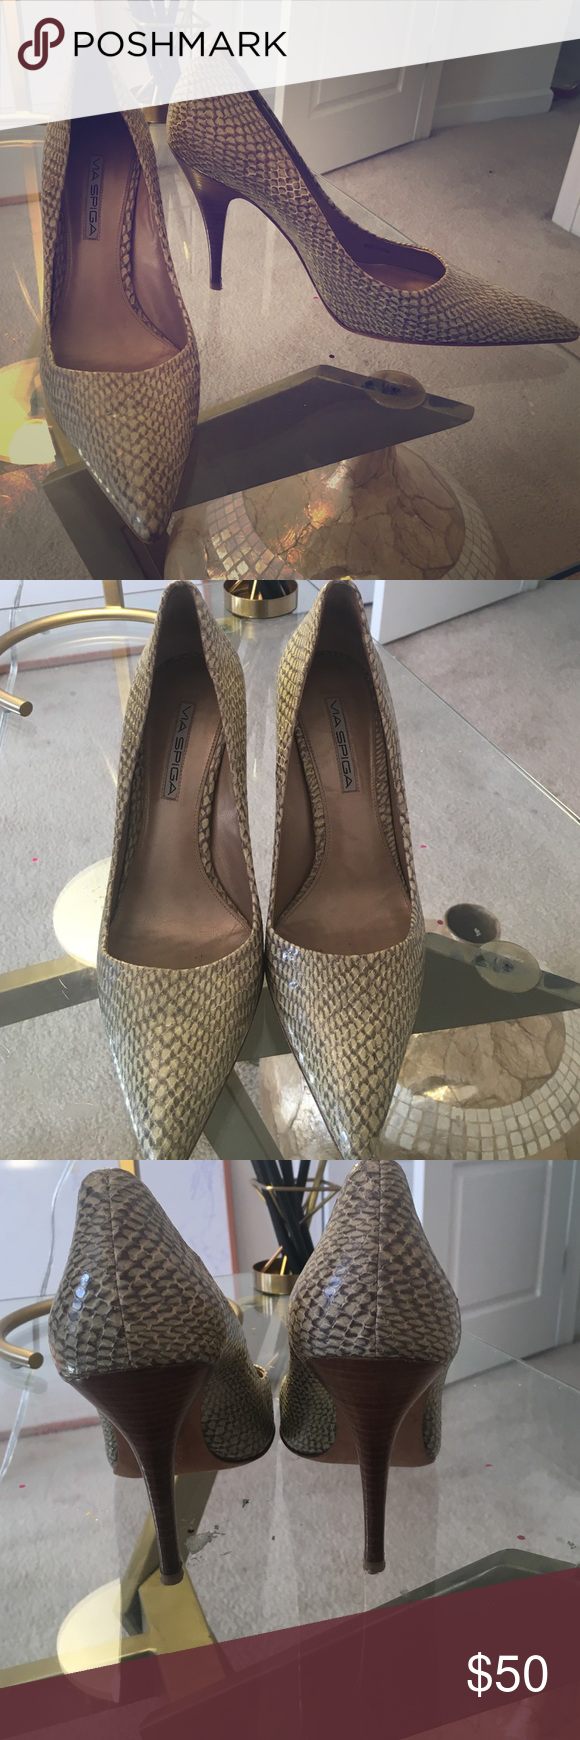 Via Spiga green toned croc heels Pointy toed green croc Via Spiga Via Spiga Shoes Heels